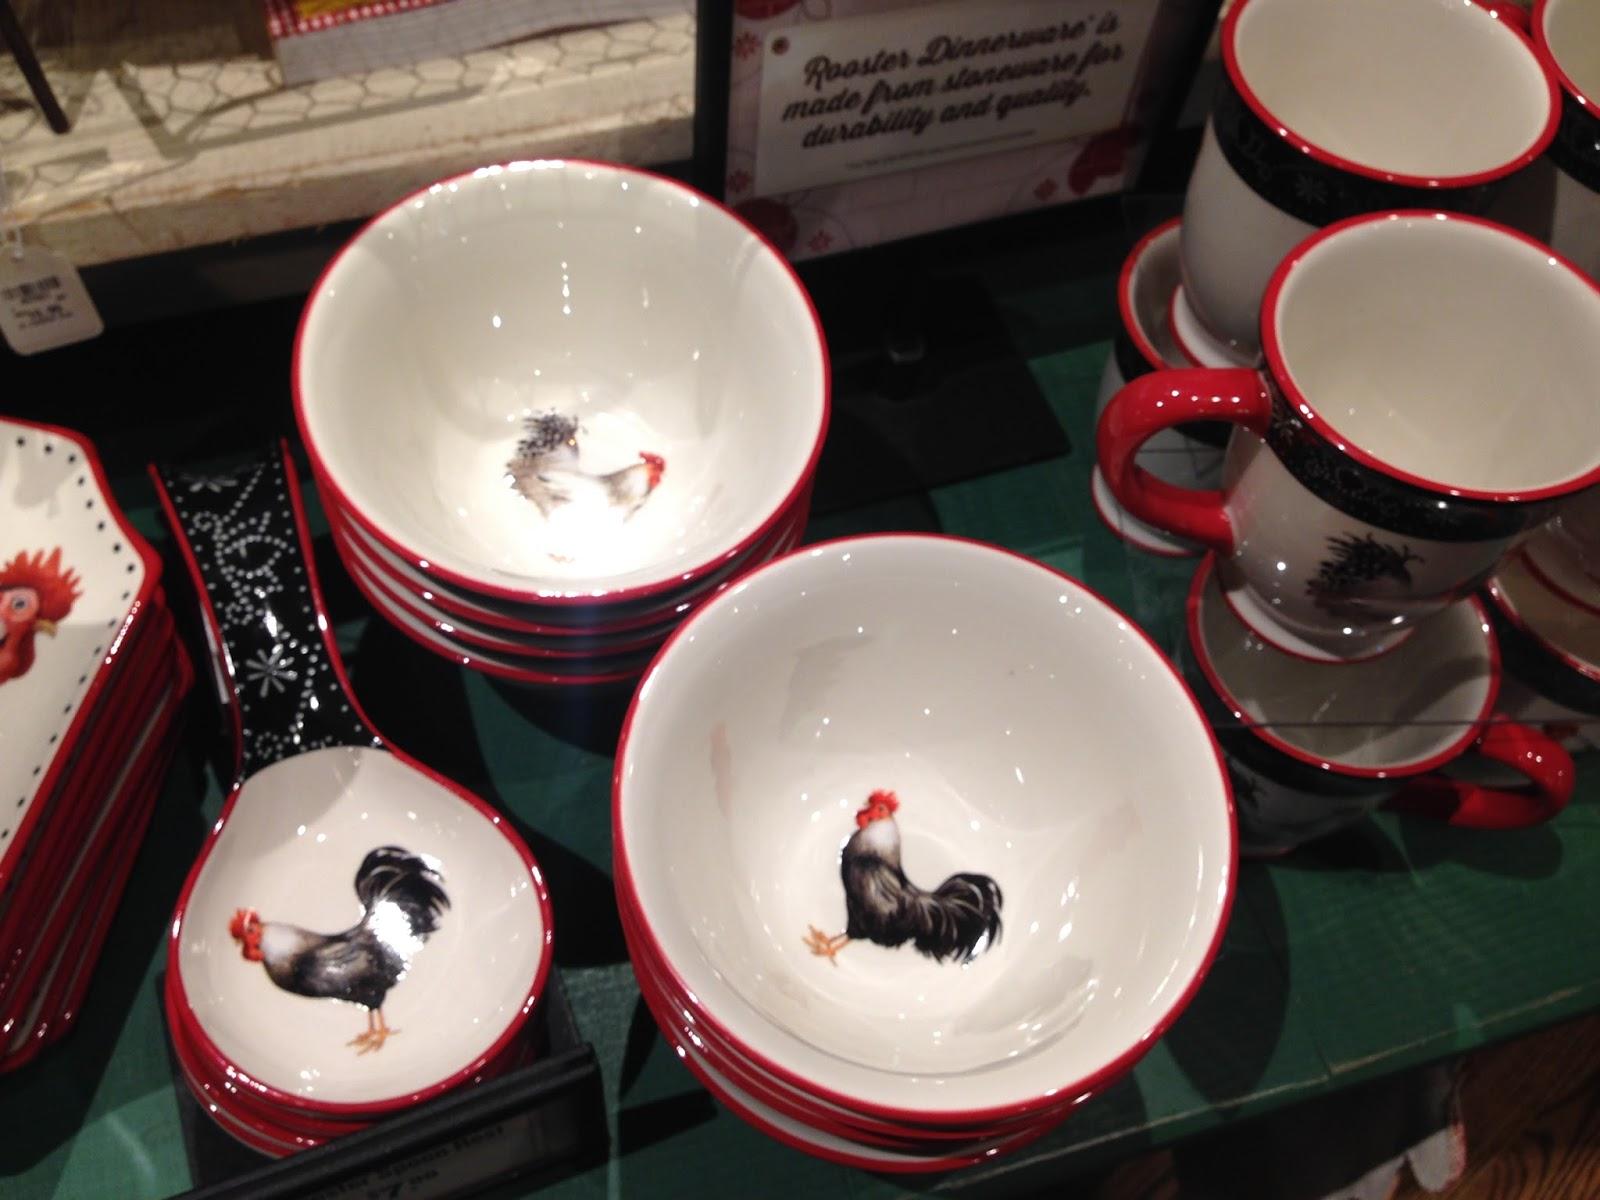 Susan Winget: Holiday Decor is at Cracker Barrel!